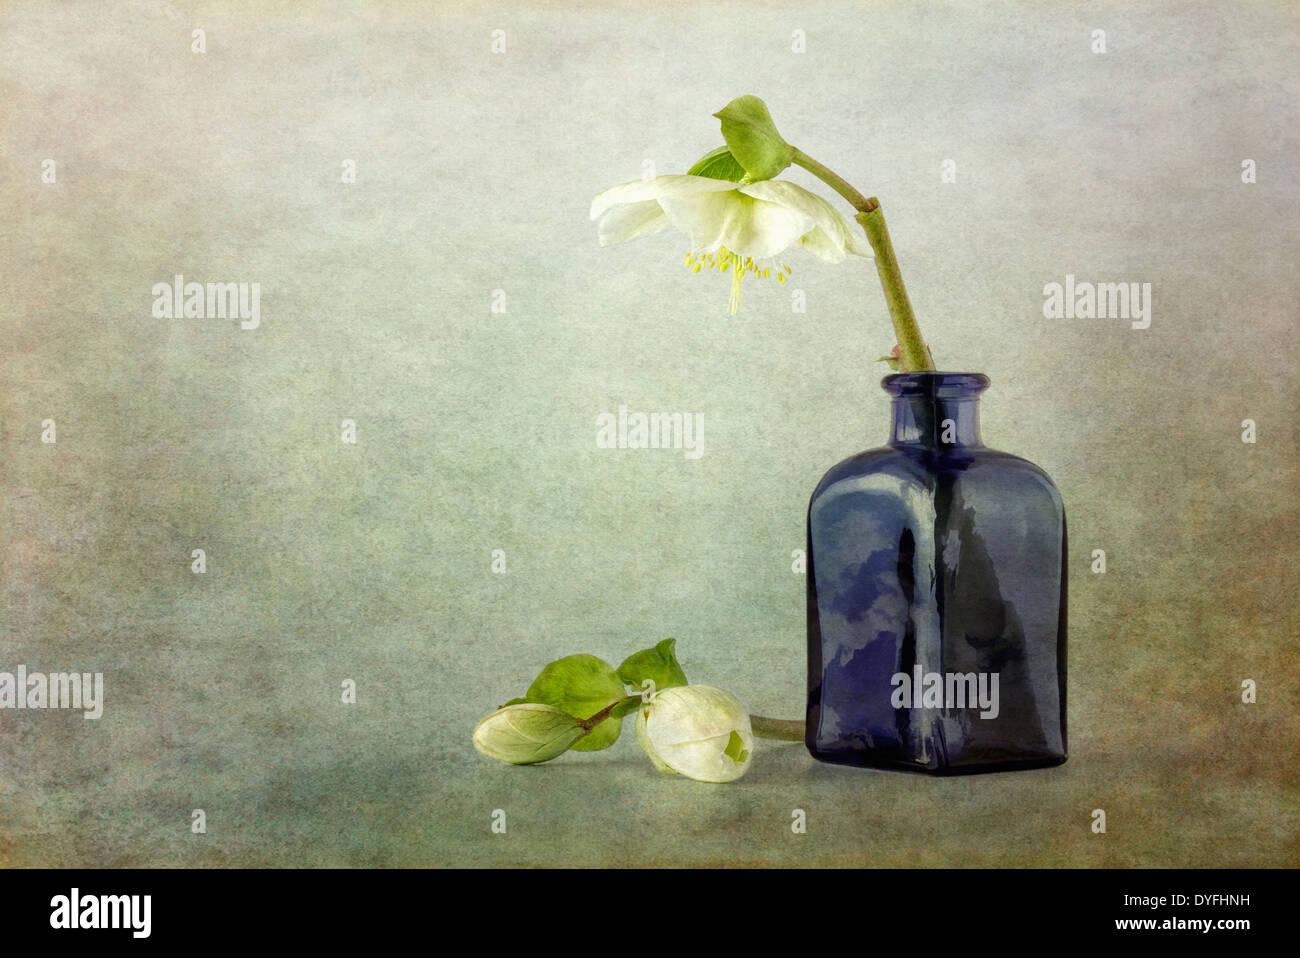 Helleborus und blaue Glasvase mit Textur-overlay Stockbild